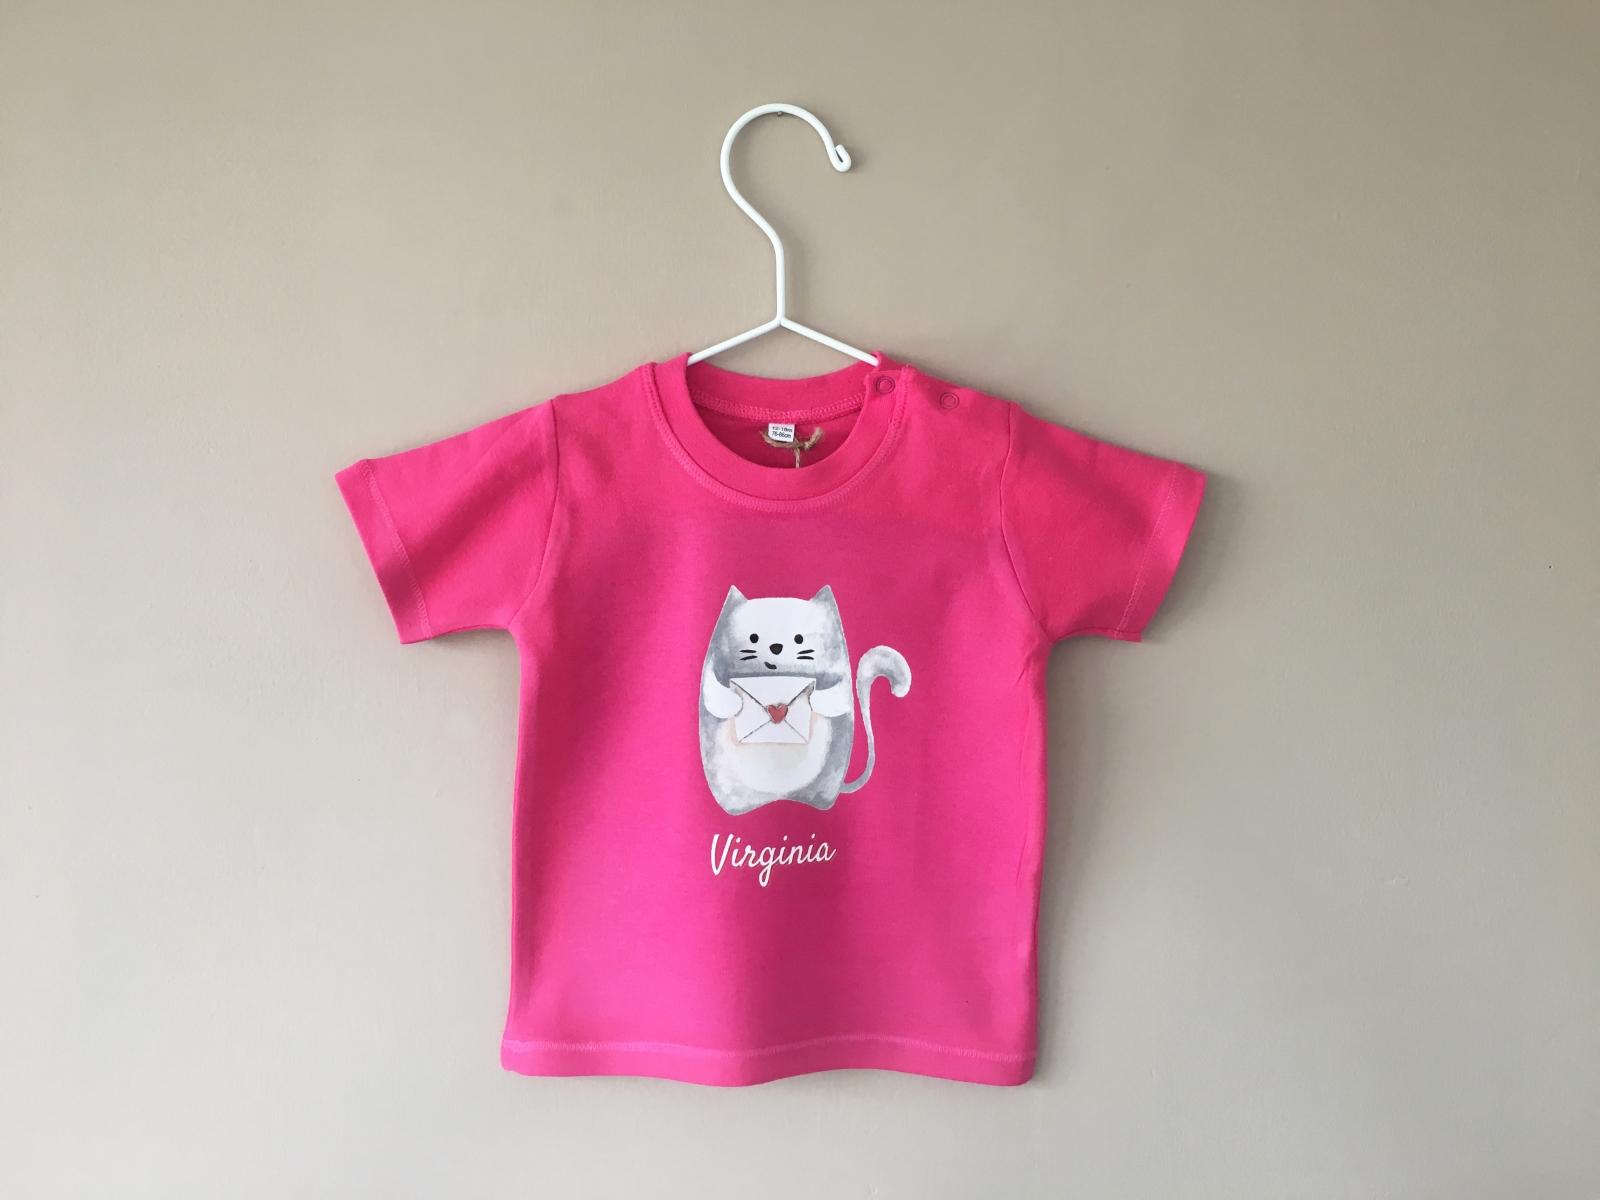 Stampa T-Shirt bambino personalizzate, magliettine bambino.